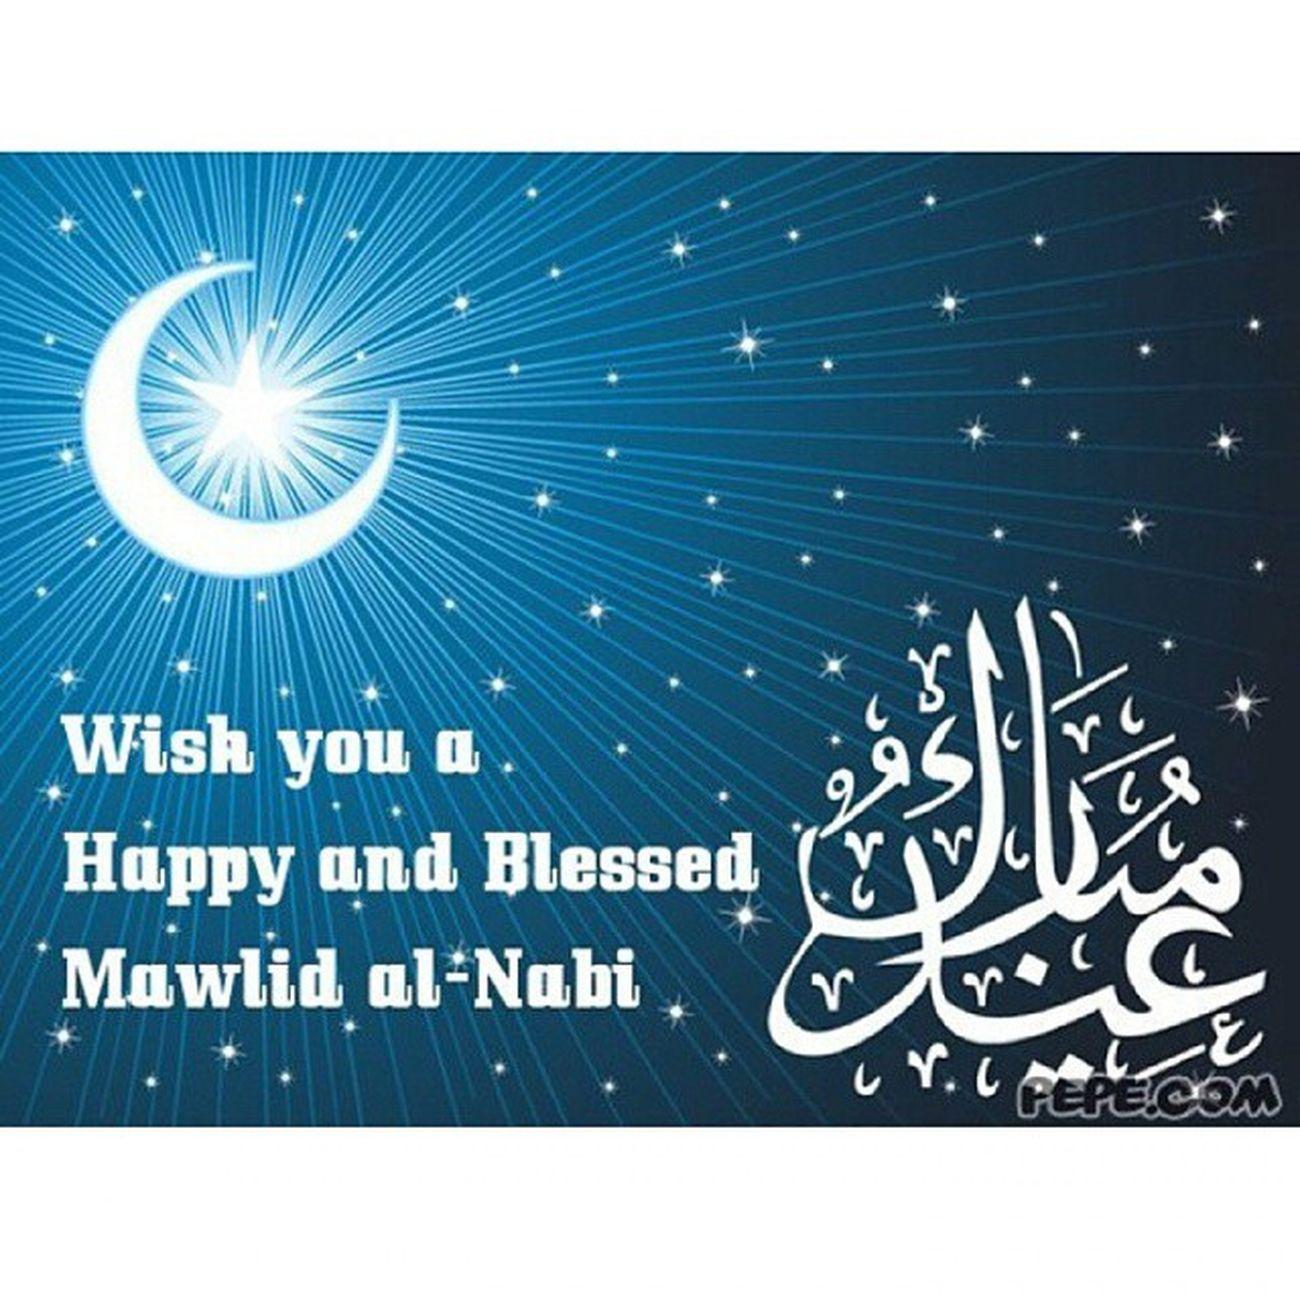 Hope Mawlid Al -Nabi Alshareef brings Peace , to you all